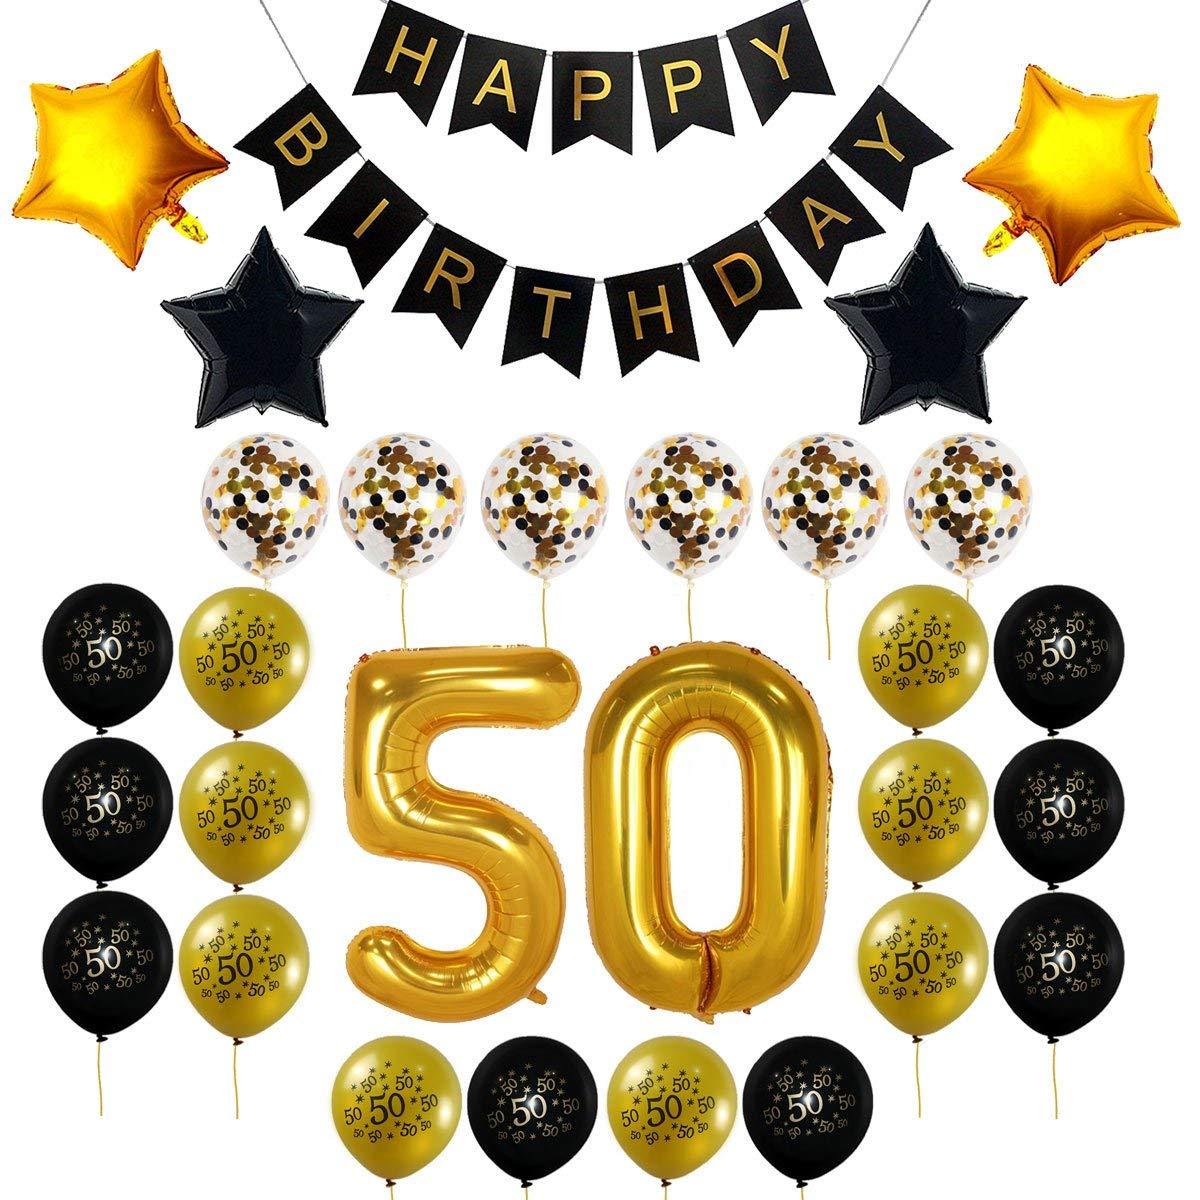 Buy decocheer 50th Birthday Decorations Gift for Men Women.